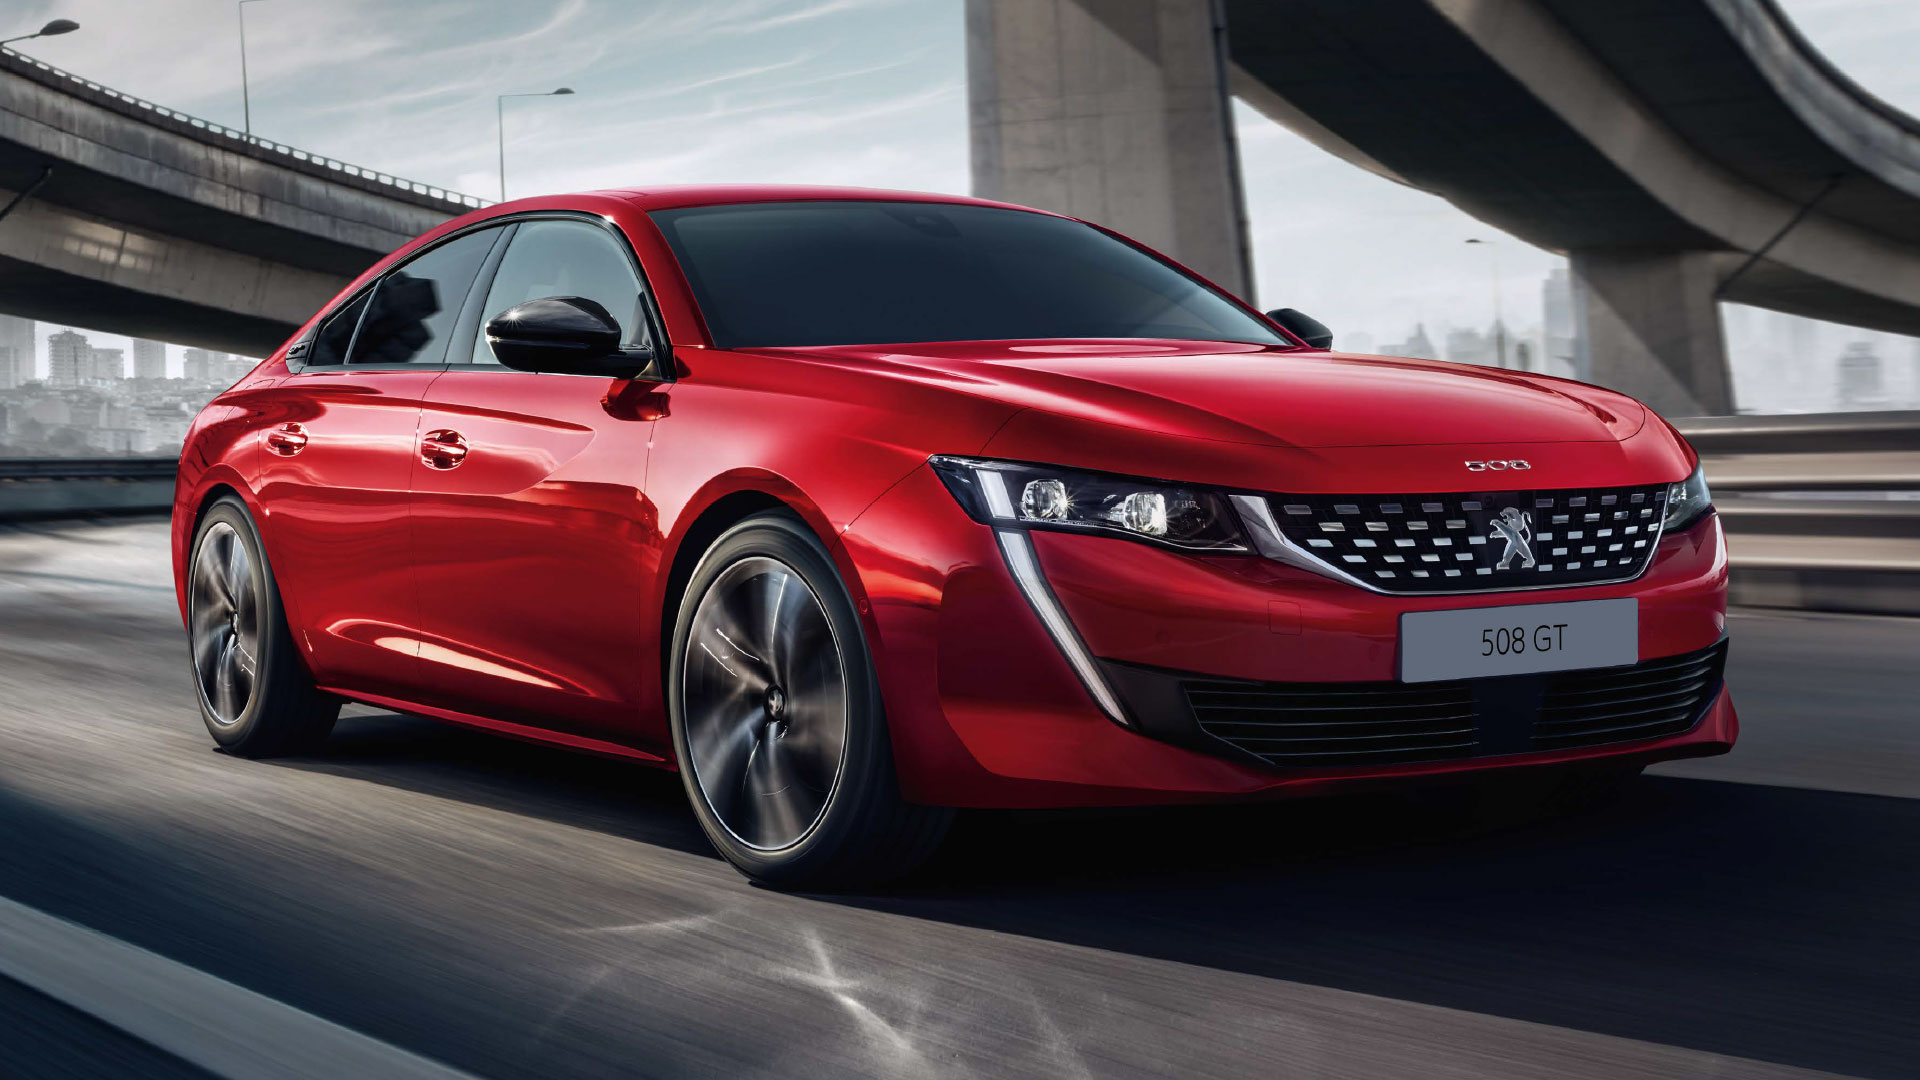 Peugeot Dealer Marketing - Launch of the PEUGEOT 508